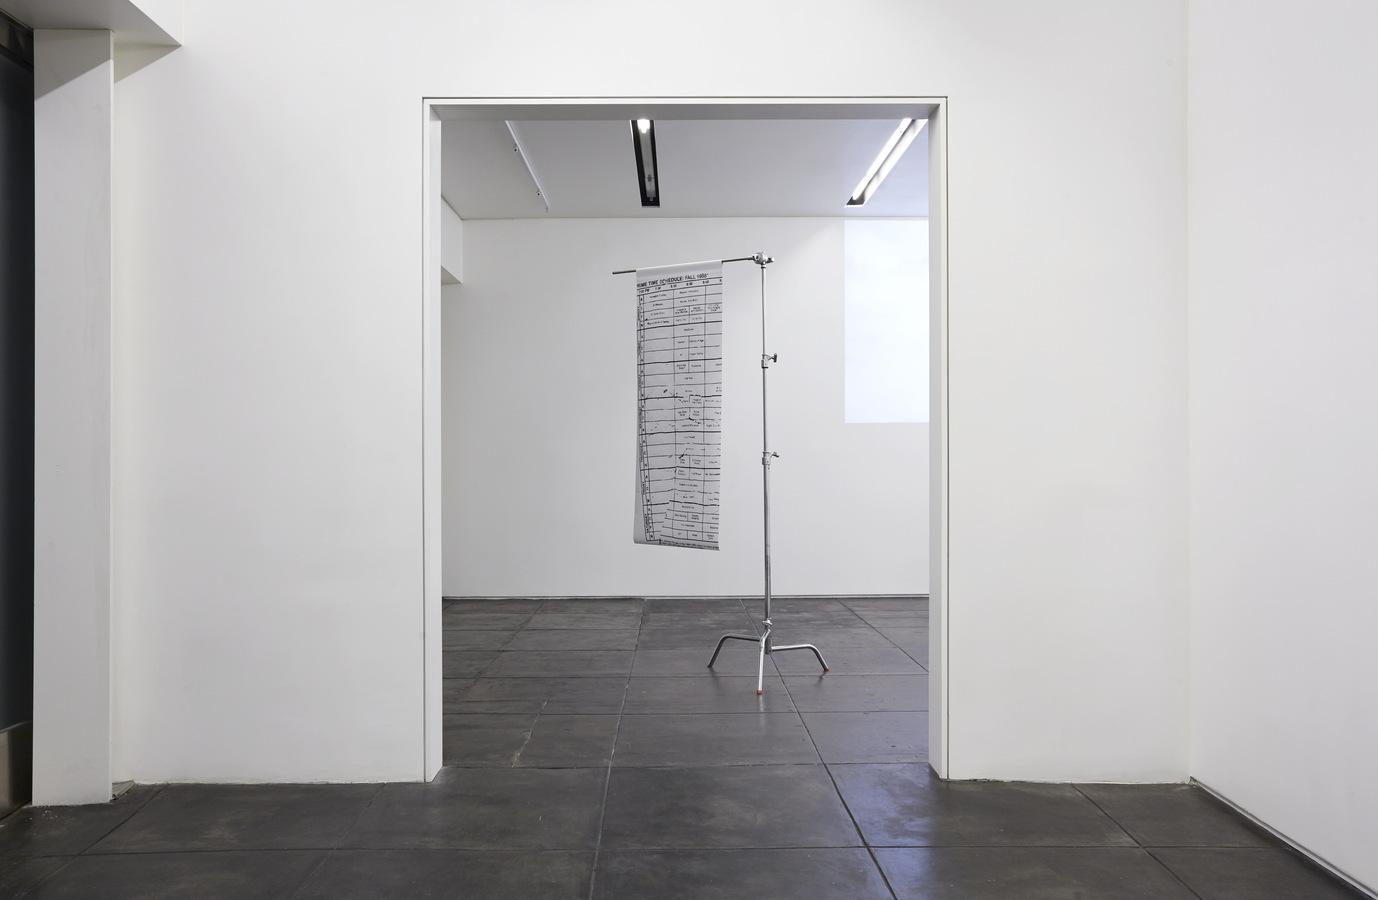 Installation view, Aran Cravey, Los Angeles, 2014.4